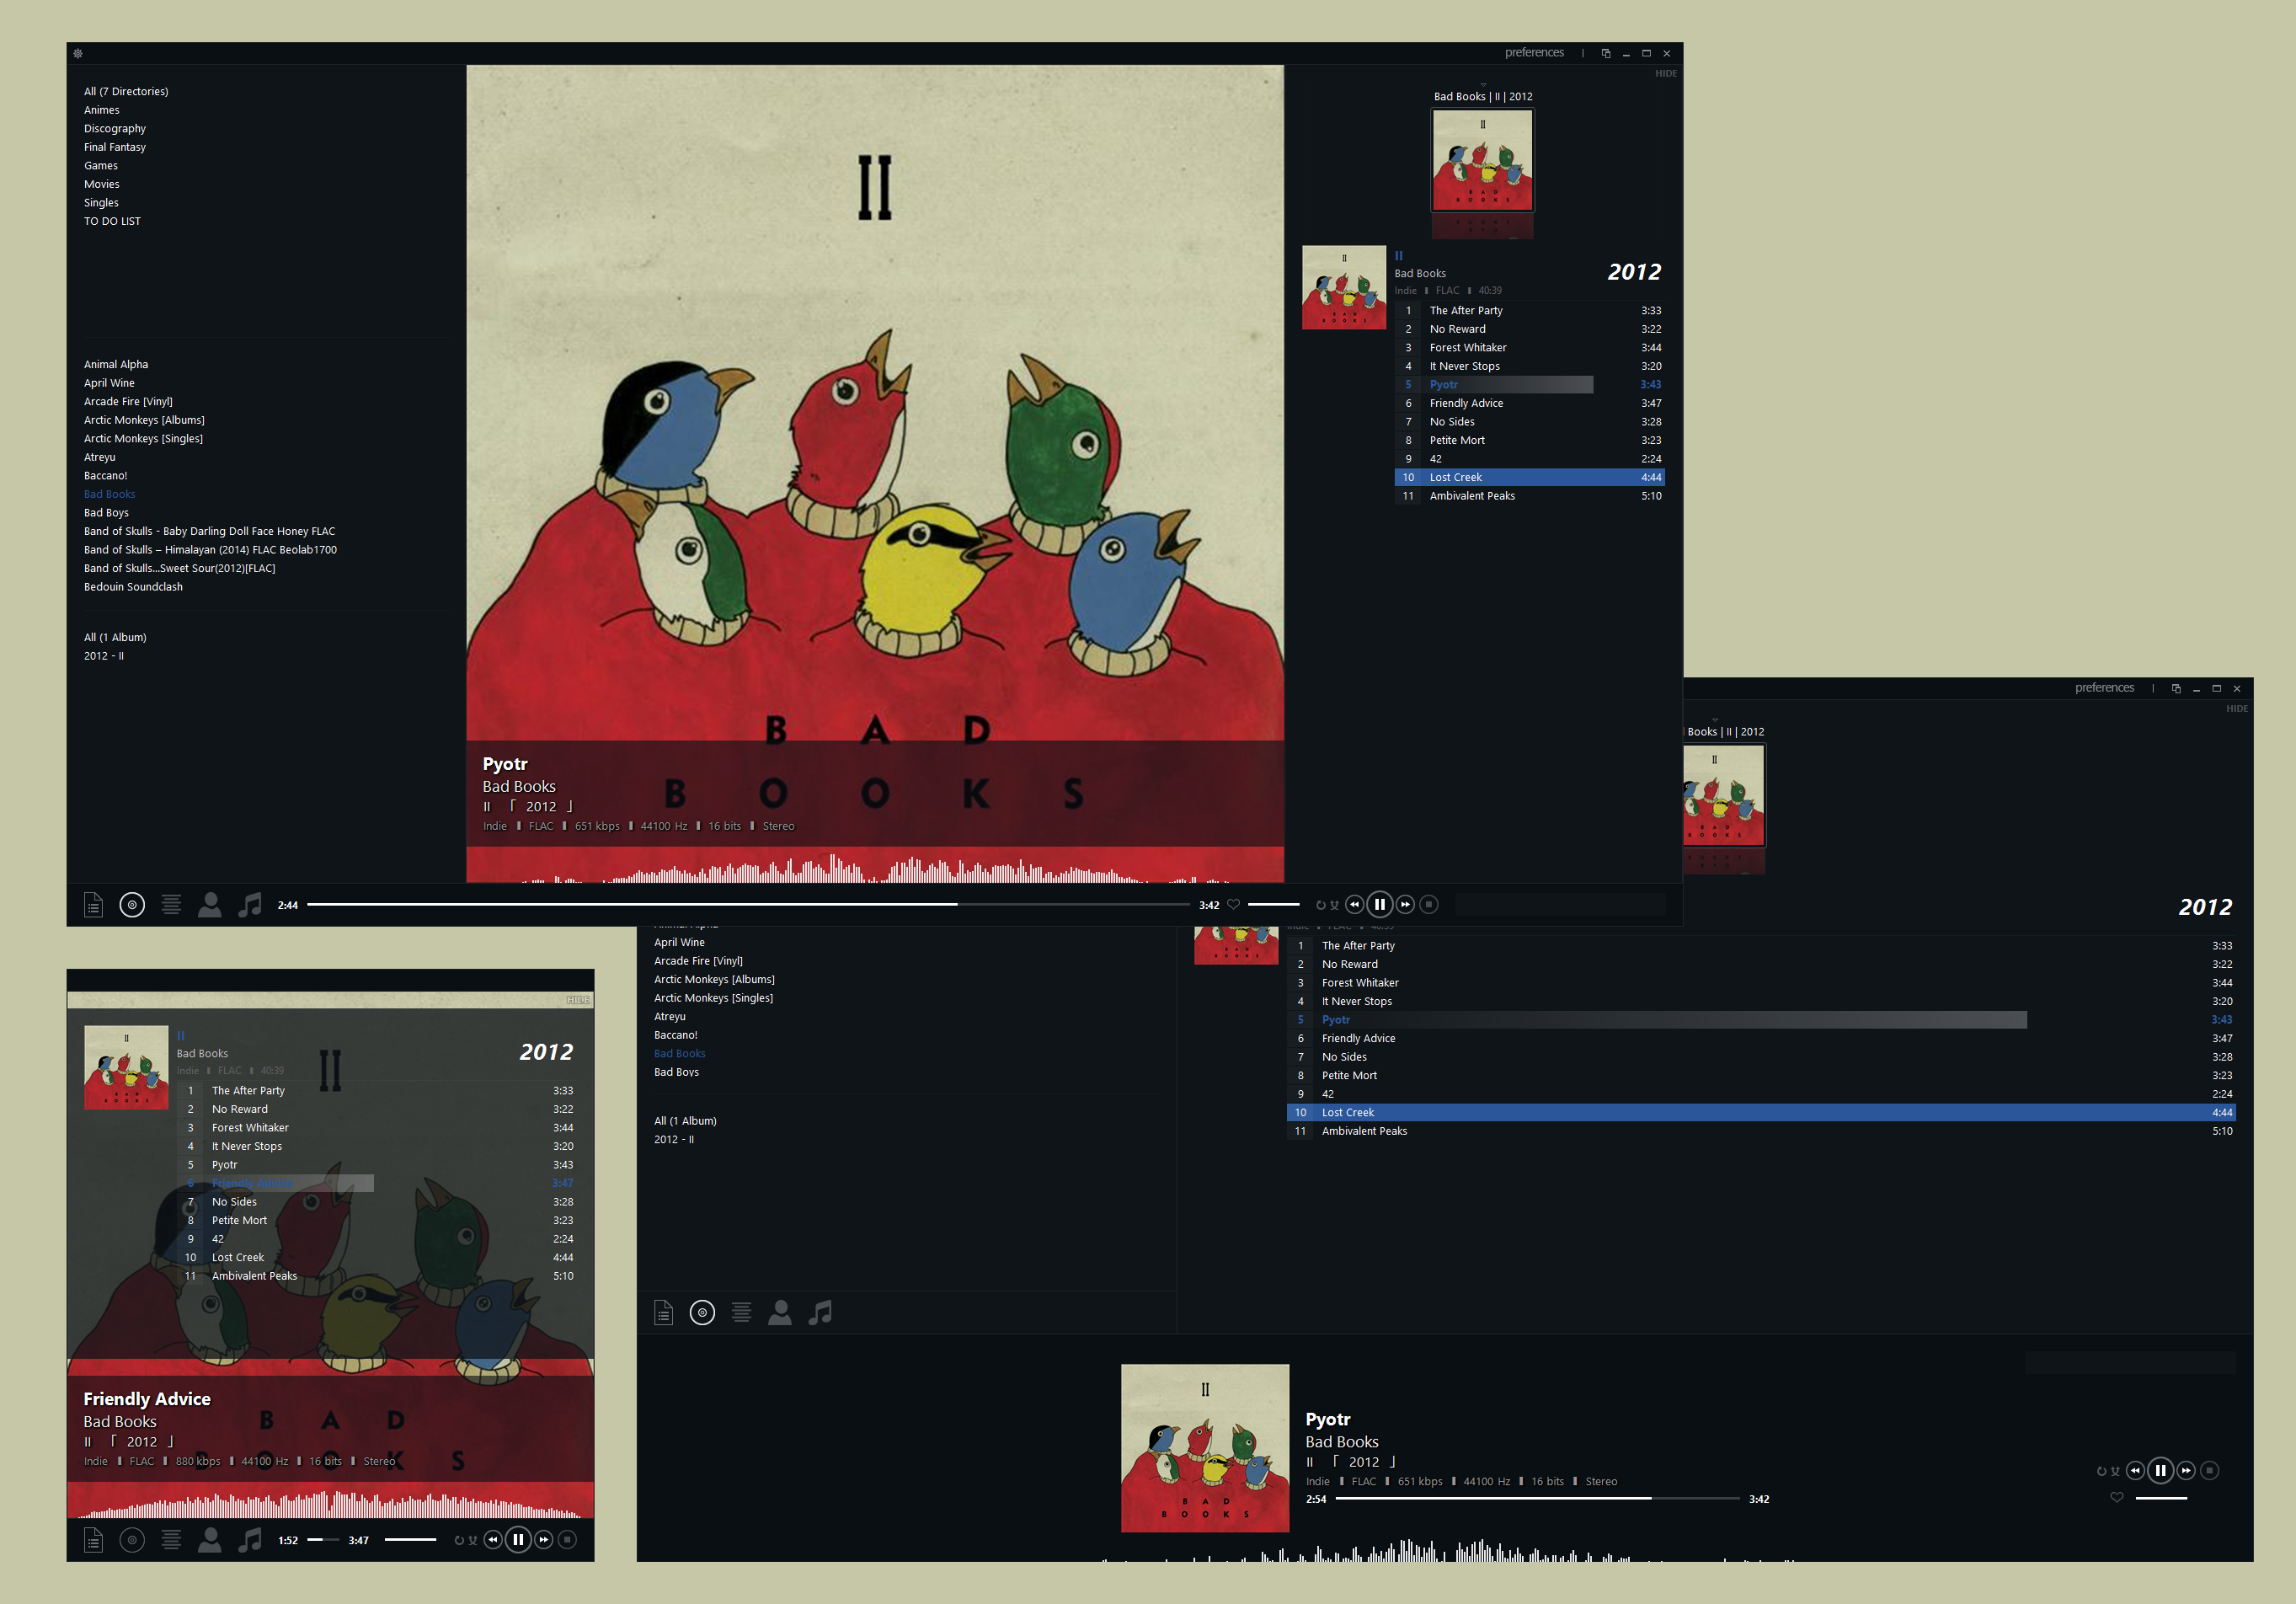 One of those foobar Metro 1.9.2 by Rikitiki11